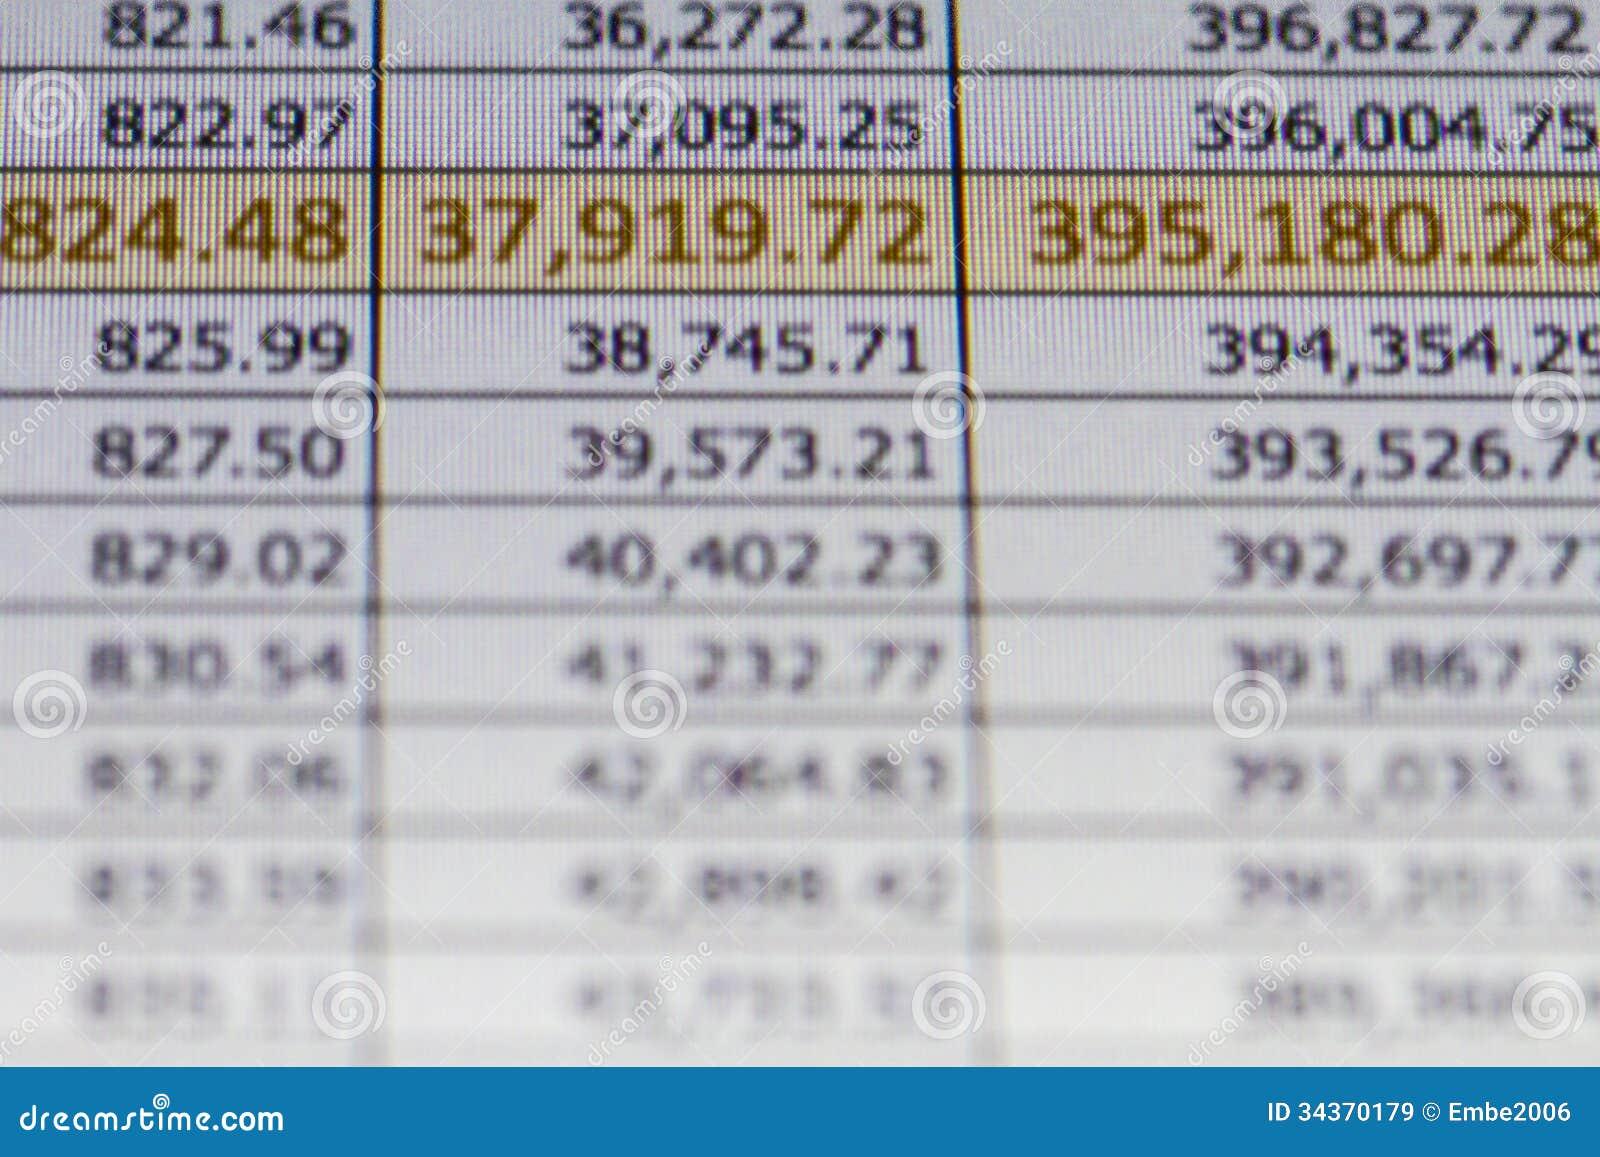 Financial Spreadsheet Stock Photo - Image: 34370150